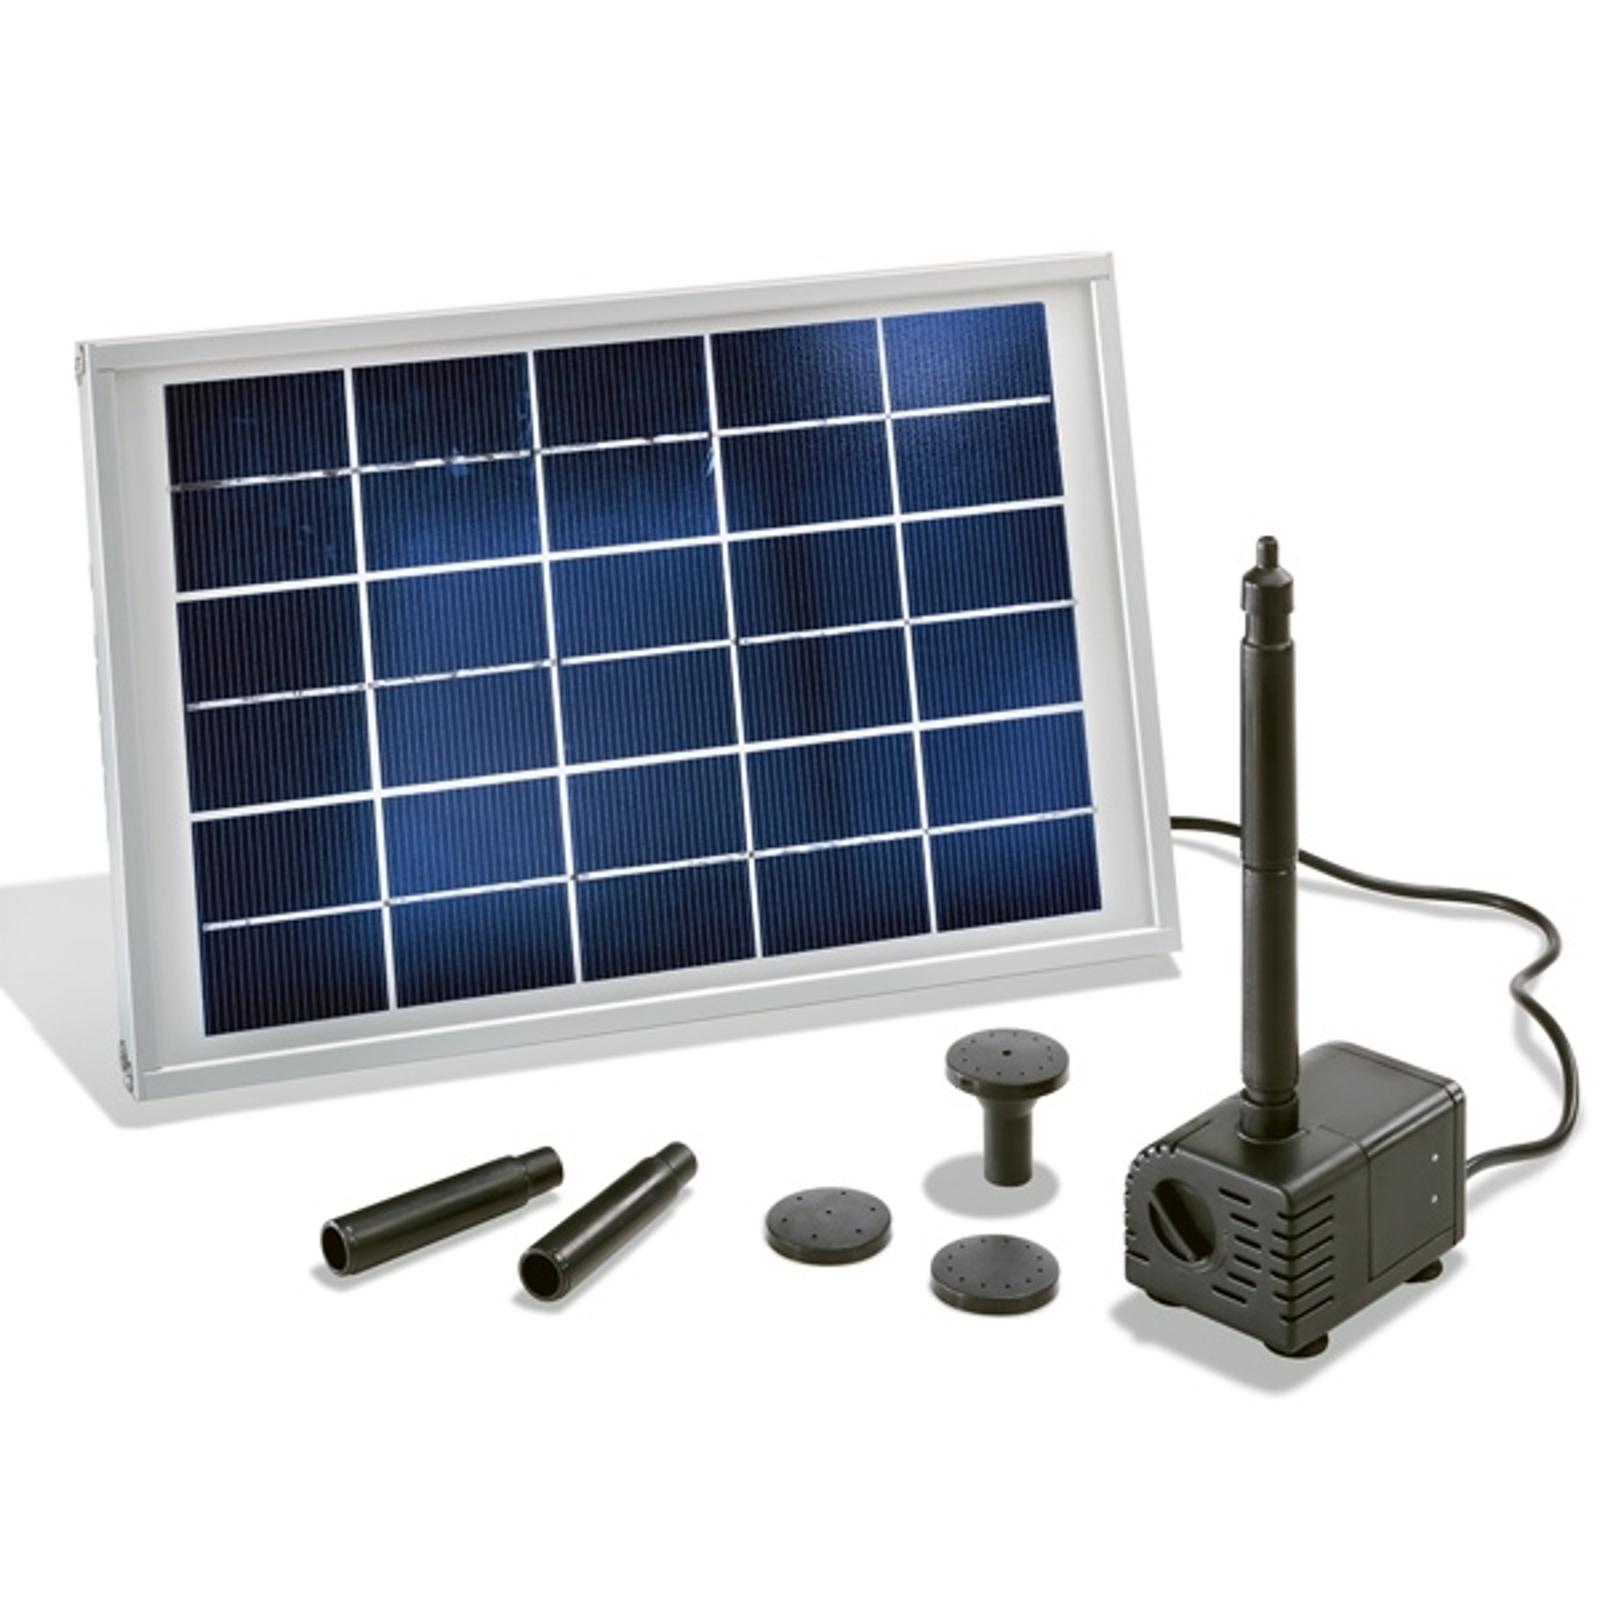 Solarpumpsystem Siena